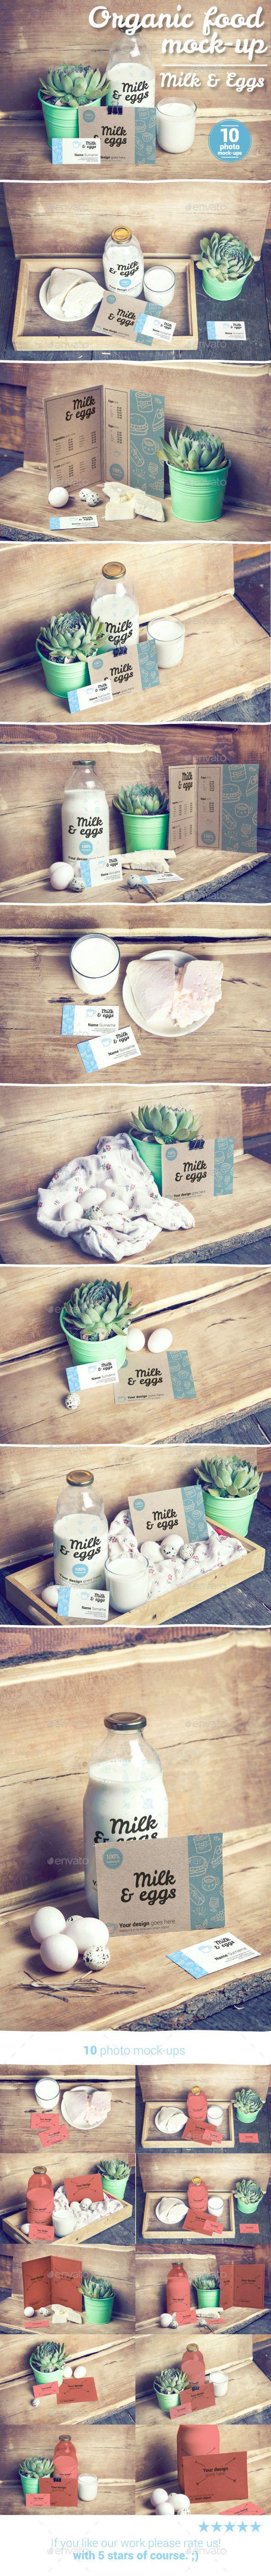 Organic Food Photo Mockup / Milk & Eggs #design #mockups Download: http://graphicriver.net/item/organic-food-photo-mockup-milk-eggs/12650525?ref=ksioks